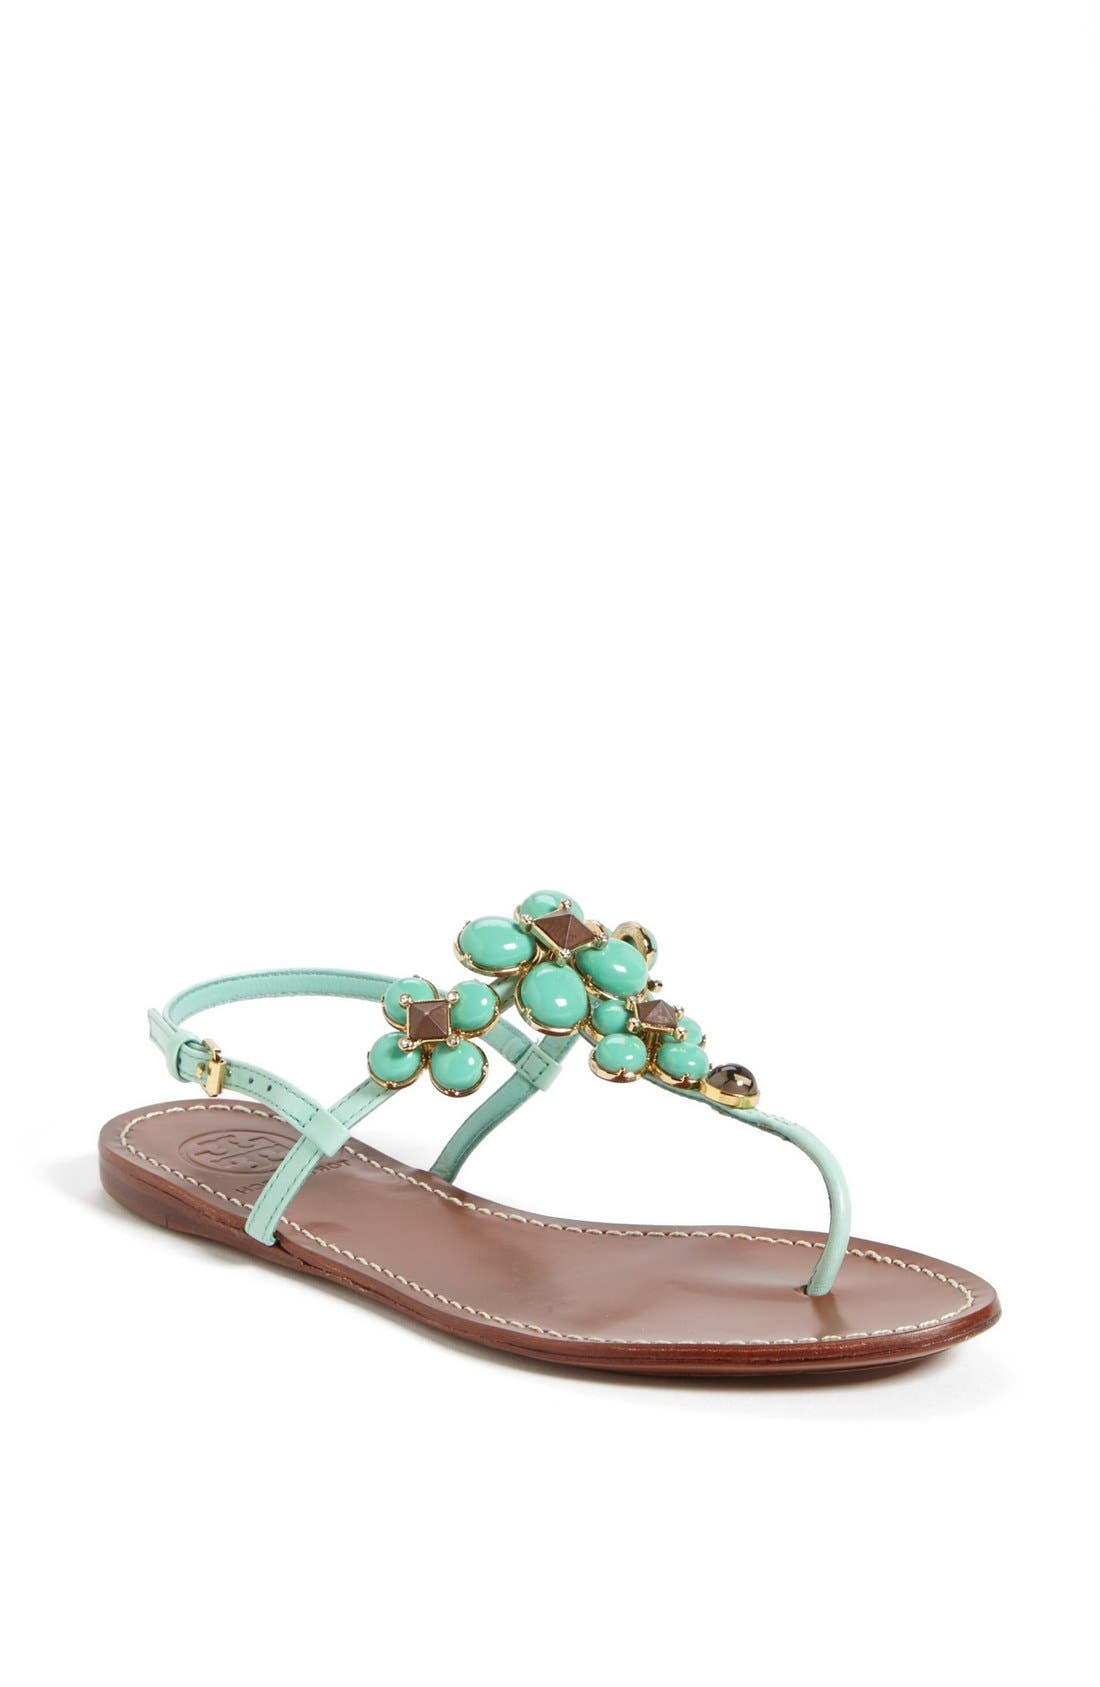 Alternate Image 1 Selected - Tory Burch 'Jameson' Thong Sandal